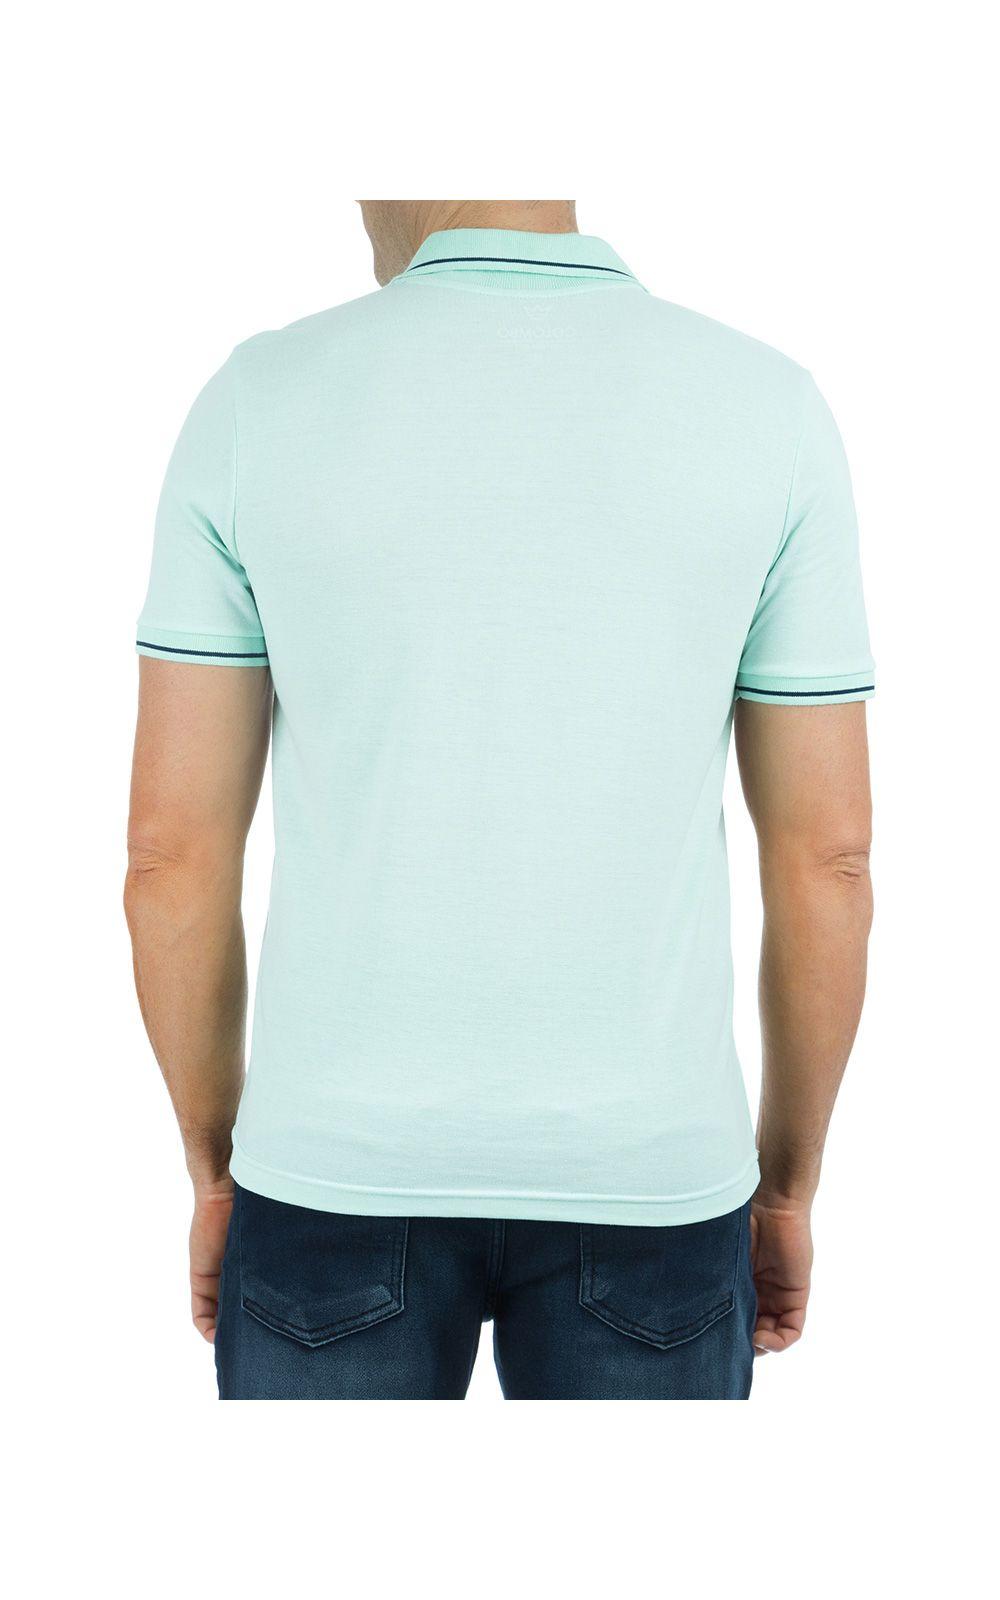 Foto 2 - Camisa Polo Masculina Verde Detalhada